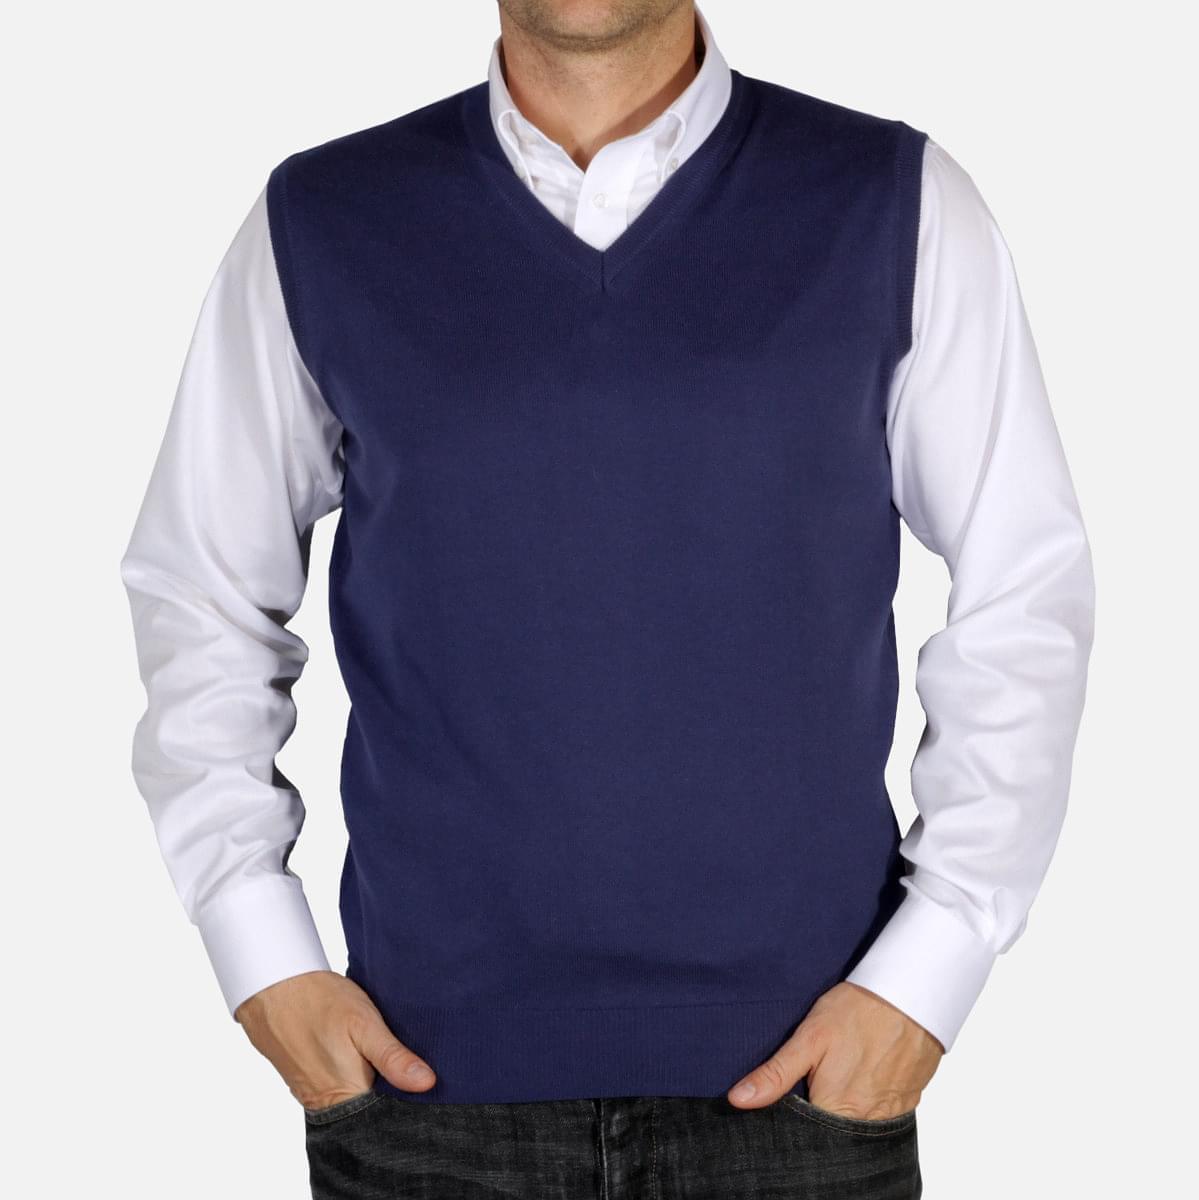 Pánská pletená vesta Willsoor 5031 v modré barvě L